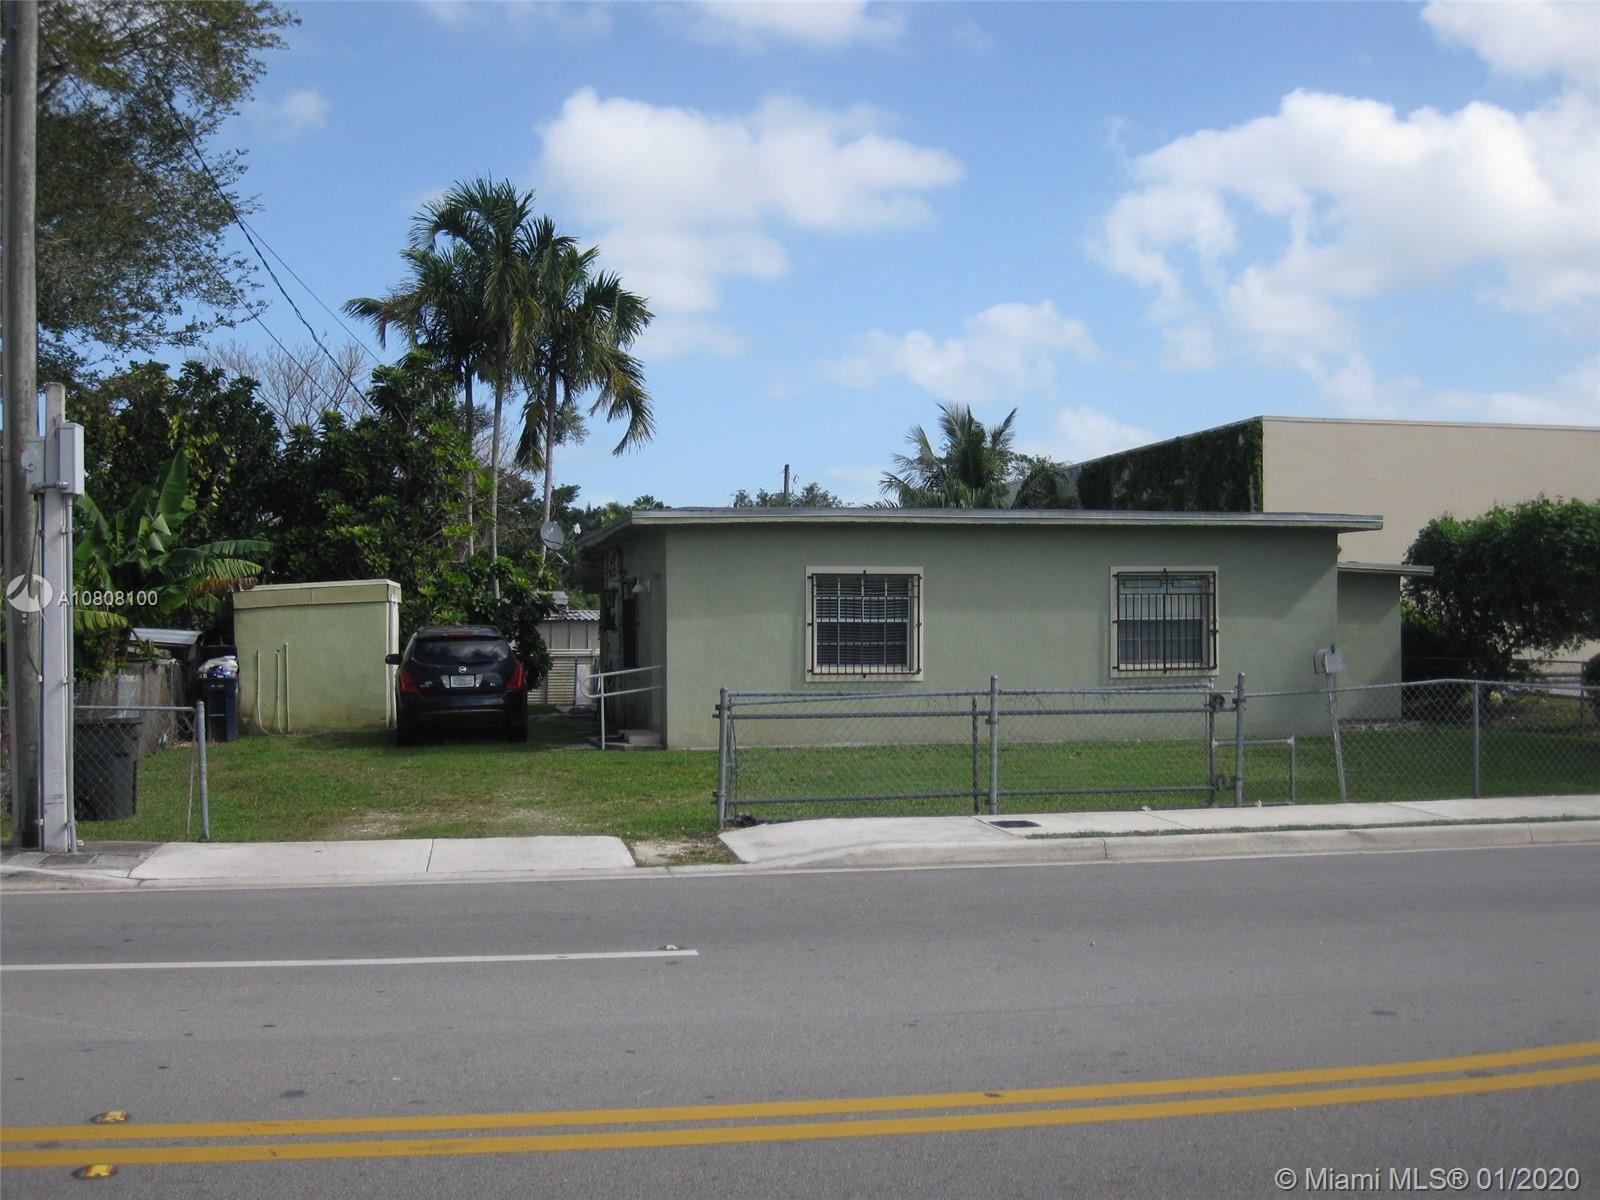 39 NW 6th Ave, Florida City, FL 33034 - Florida City, FL real estate listing